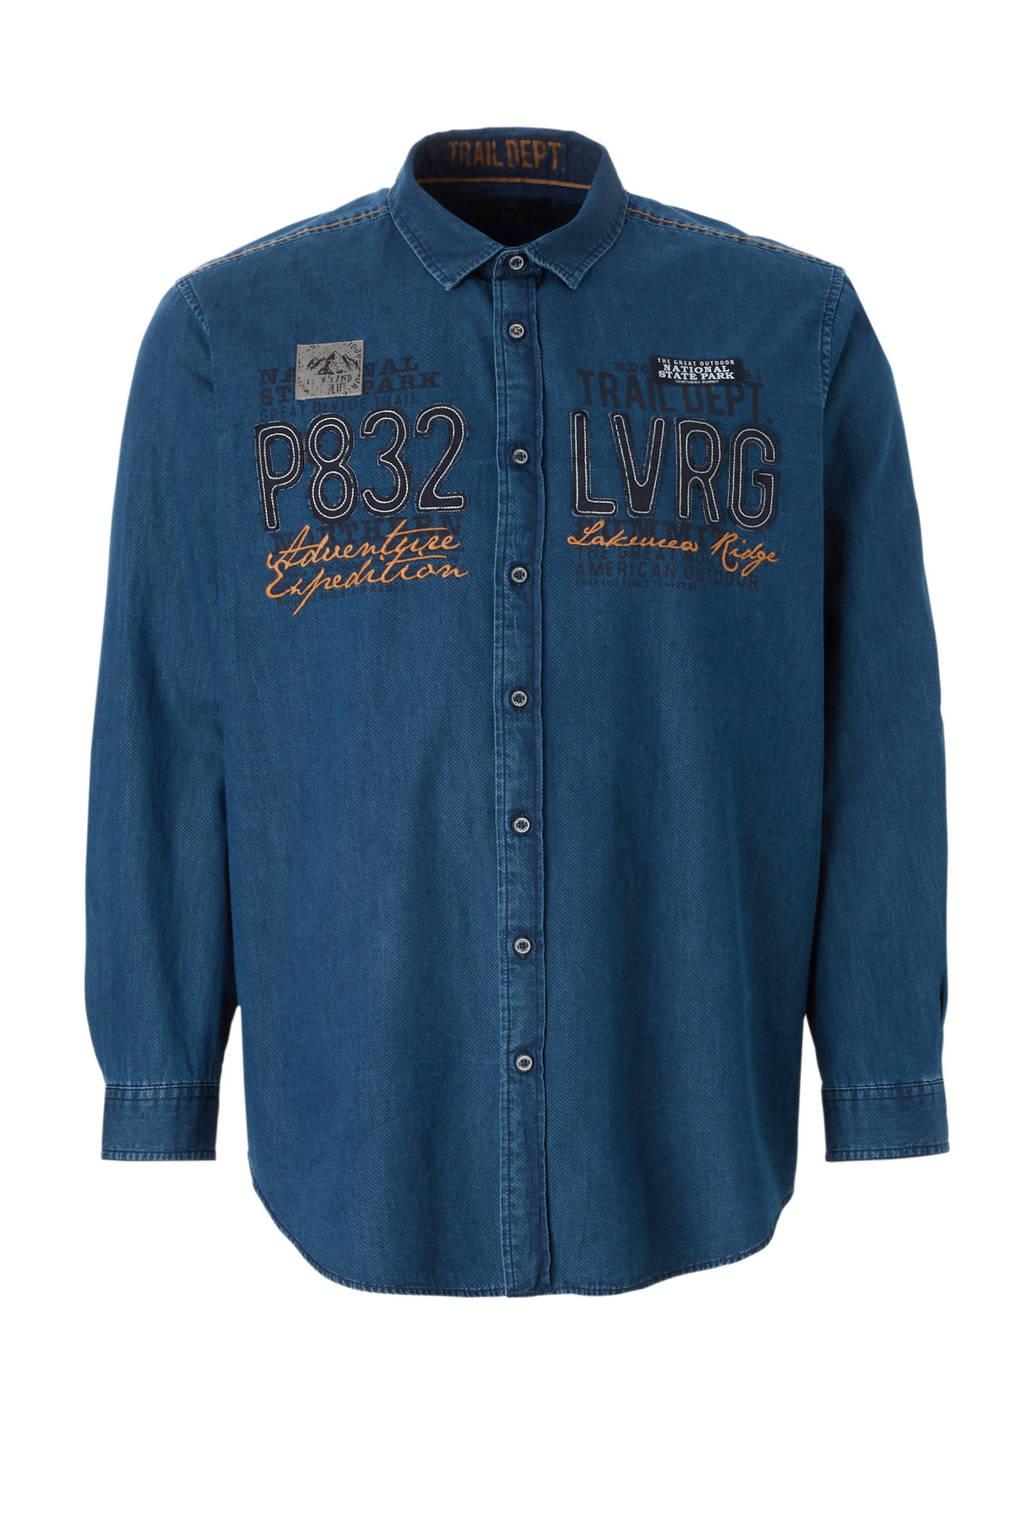 C&A XL Canda denim overhemd met tekstopdruk blauw, Blauw